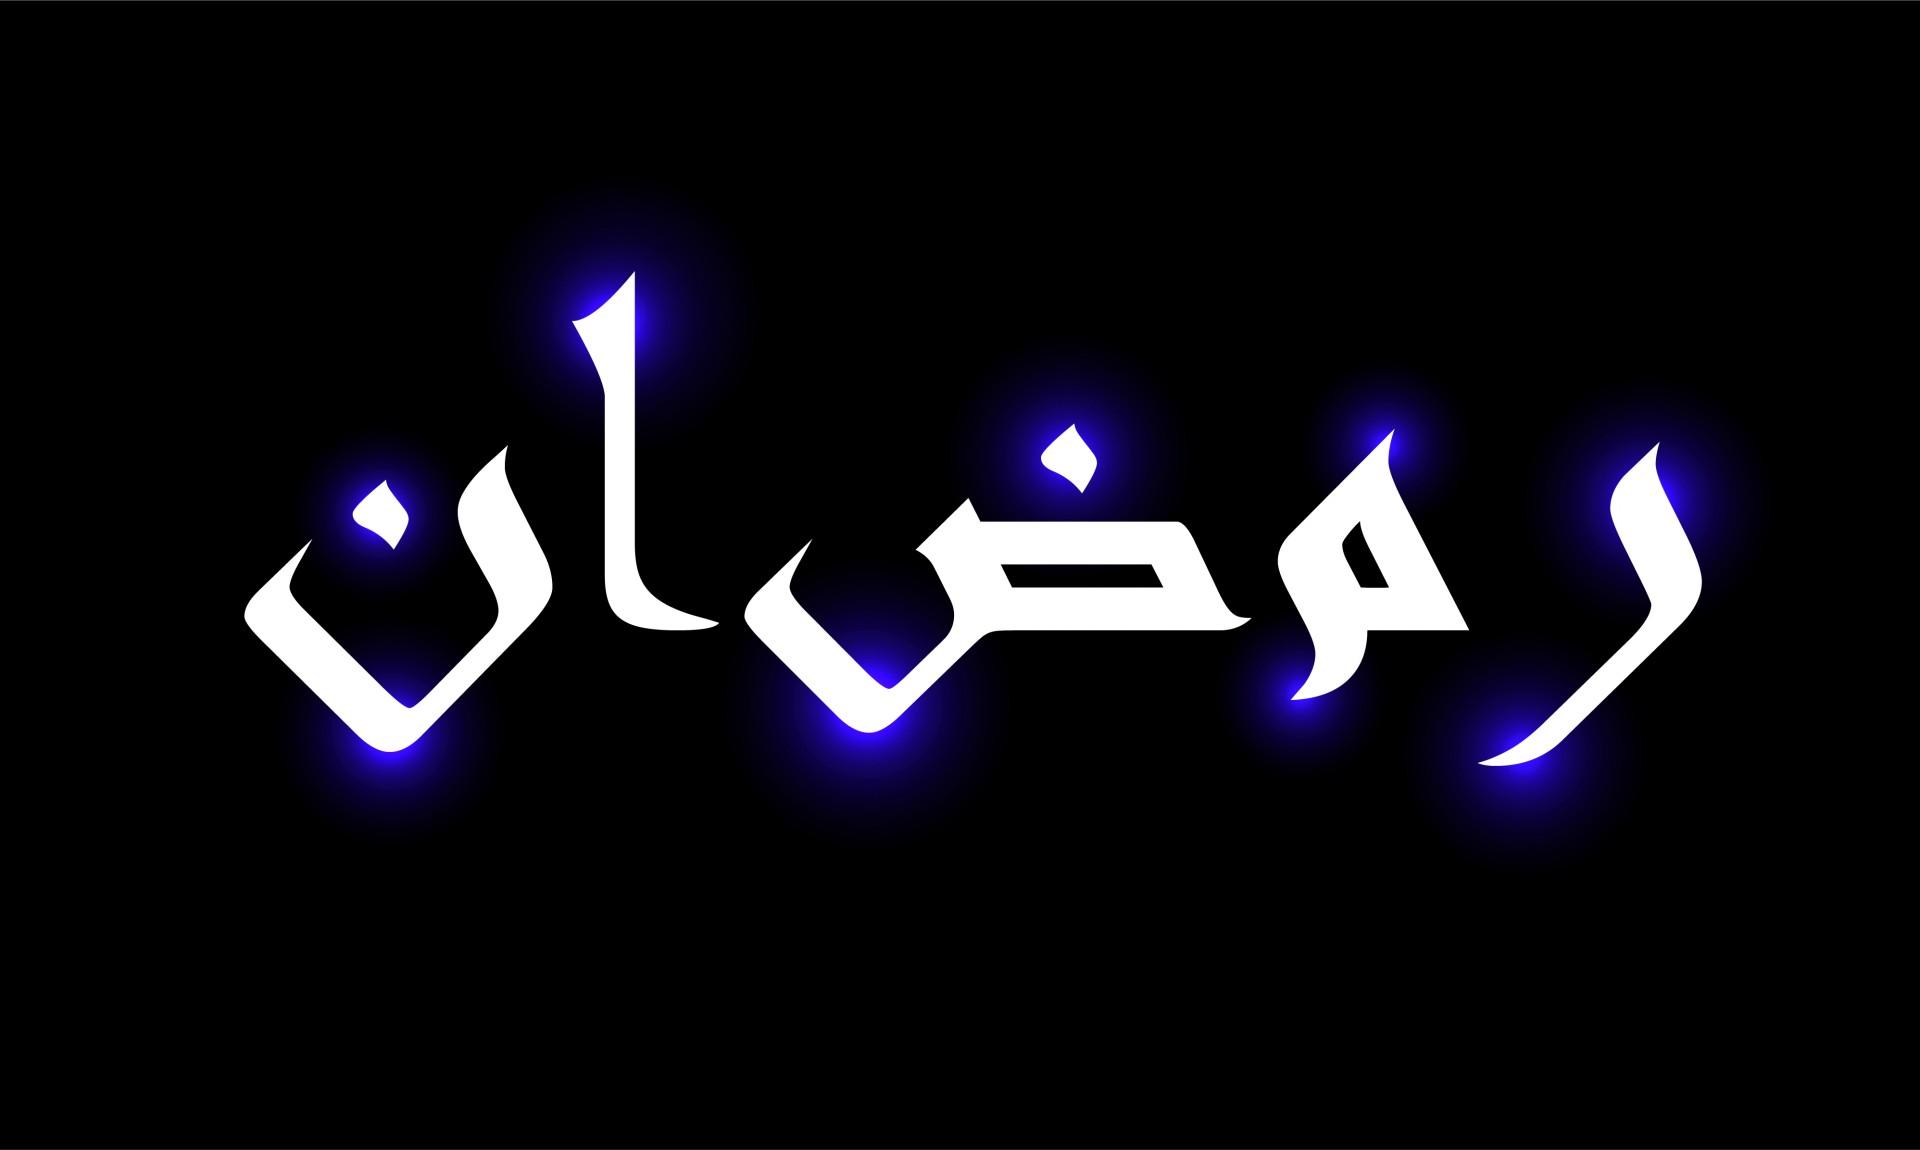 quran-summary-juz-1-2-surah-fatiha-and-baqarah